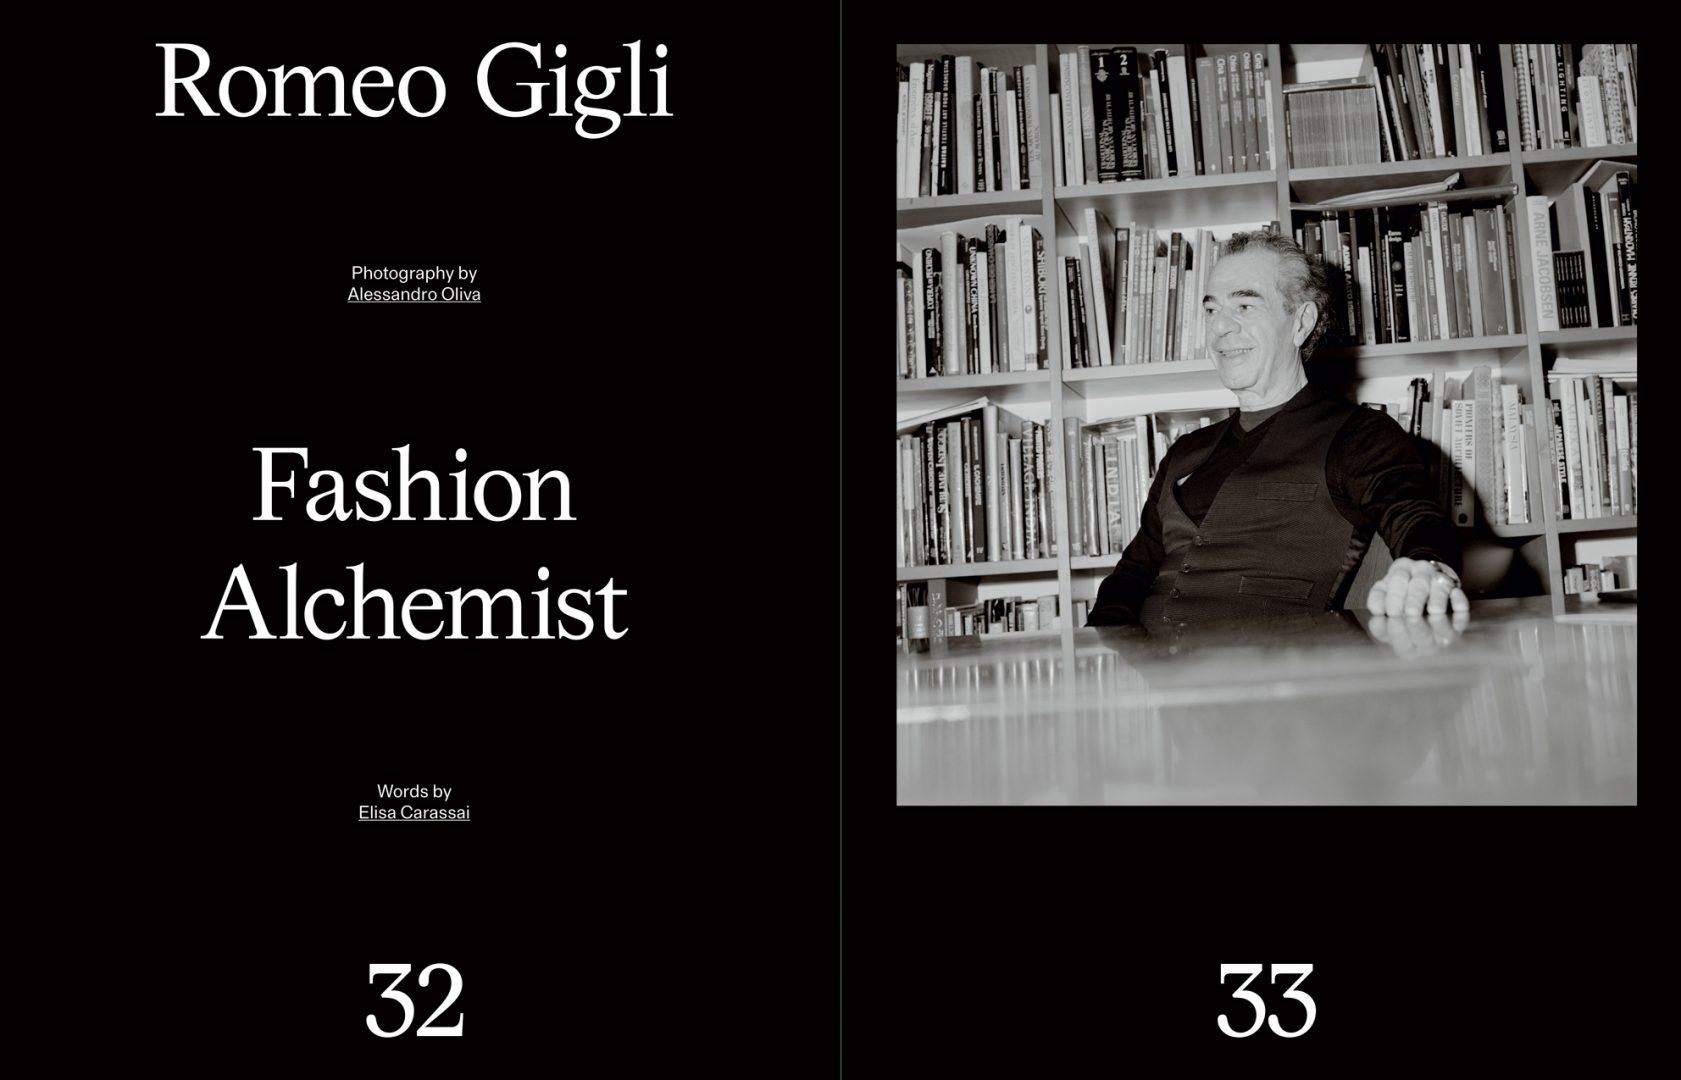 Sali e Tabacchi Journal, Romeo Gigli, Photographed by Alessandro Oliva